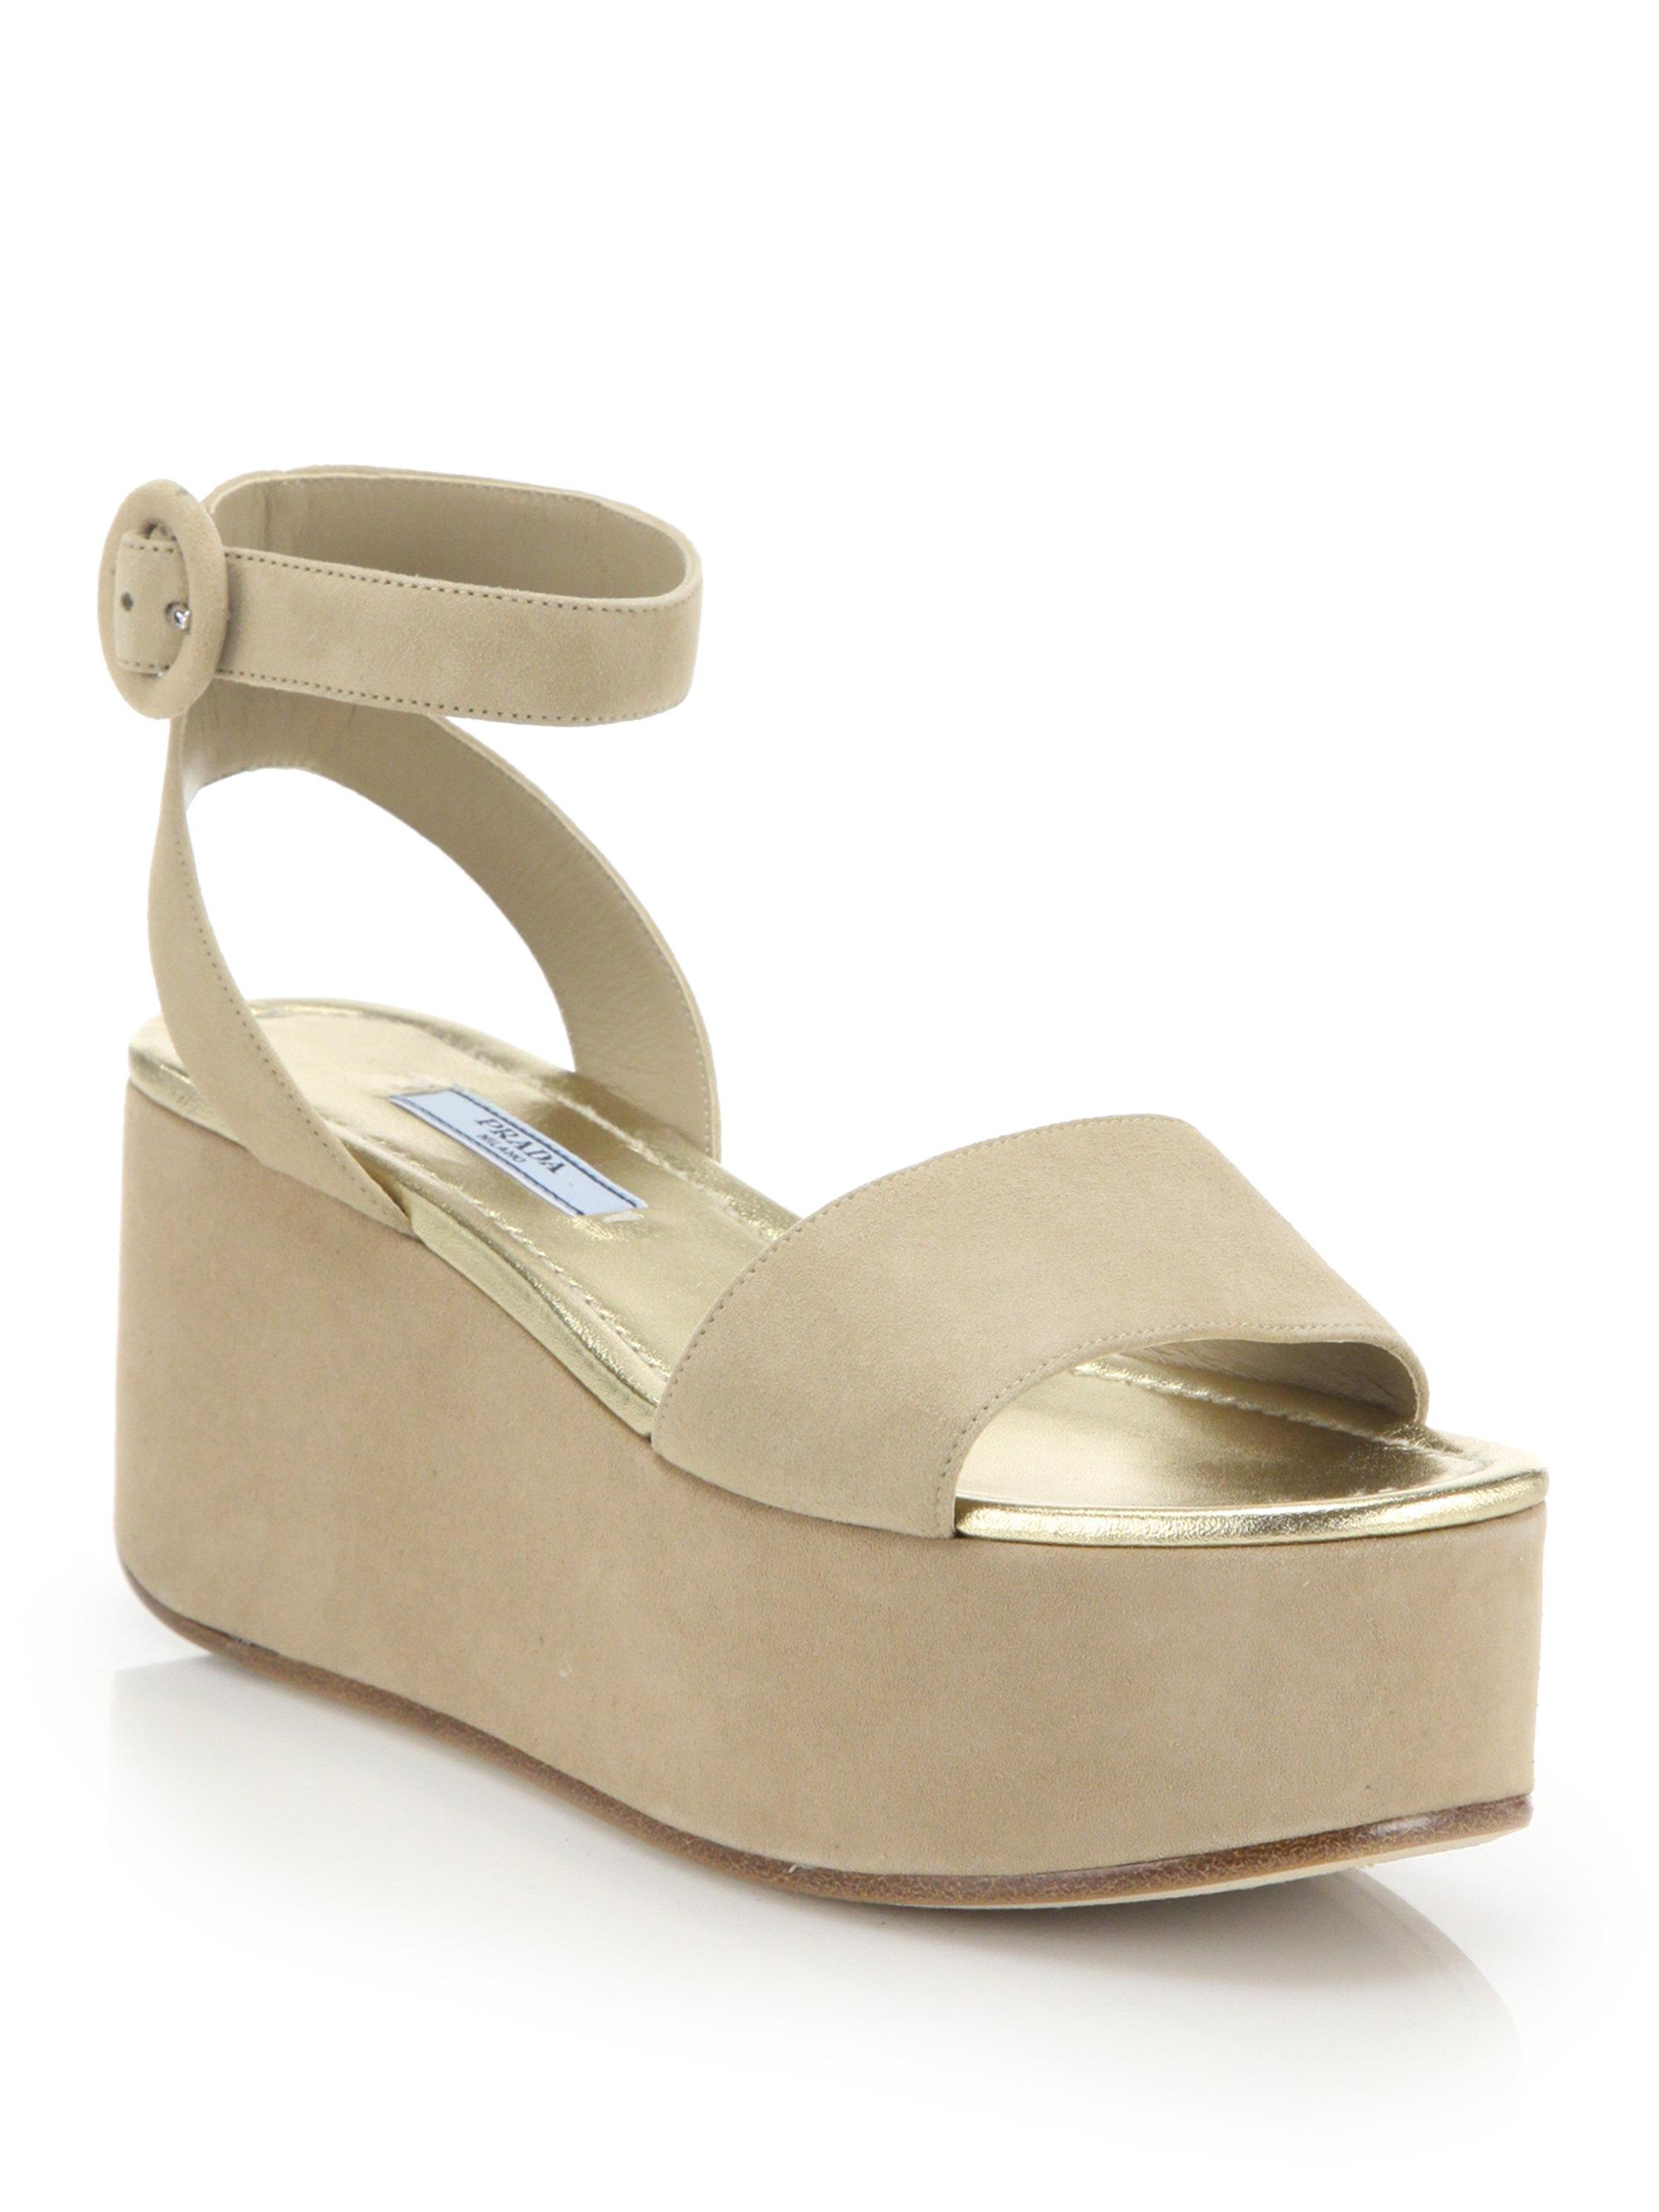 Lyst - Prada Suede Platform Wedge Sandals in Natural